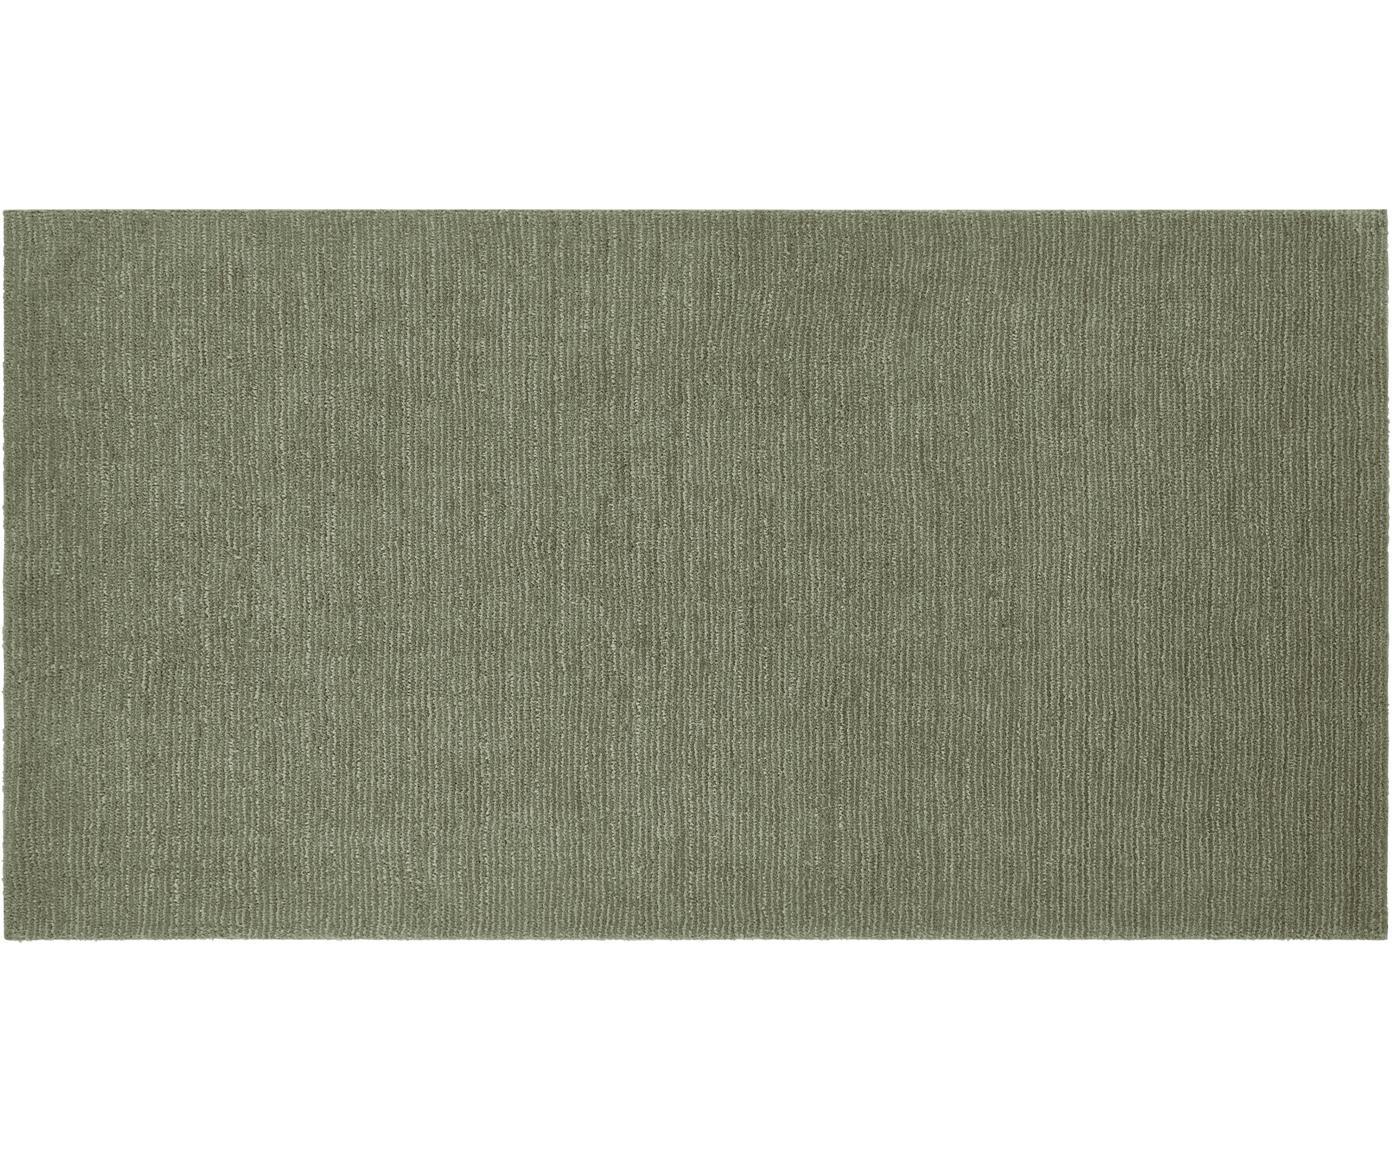 Vloerkleed Supersoft, Polyester, Mosgroen, B 80 x L 150 cm (maat XS)